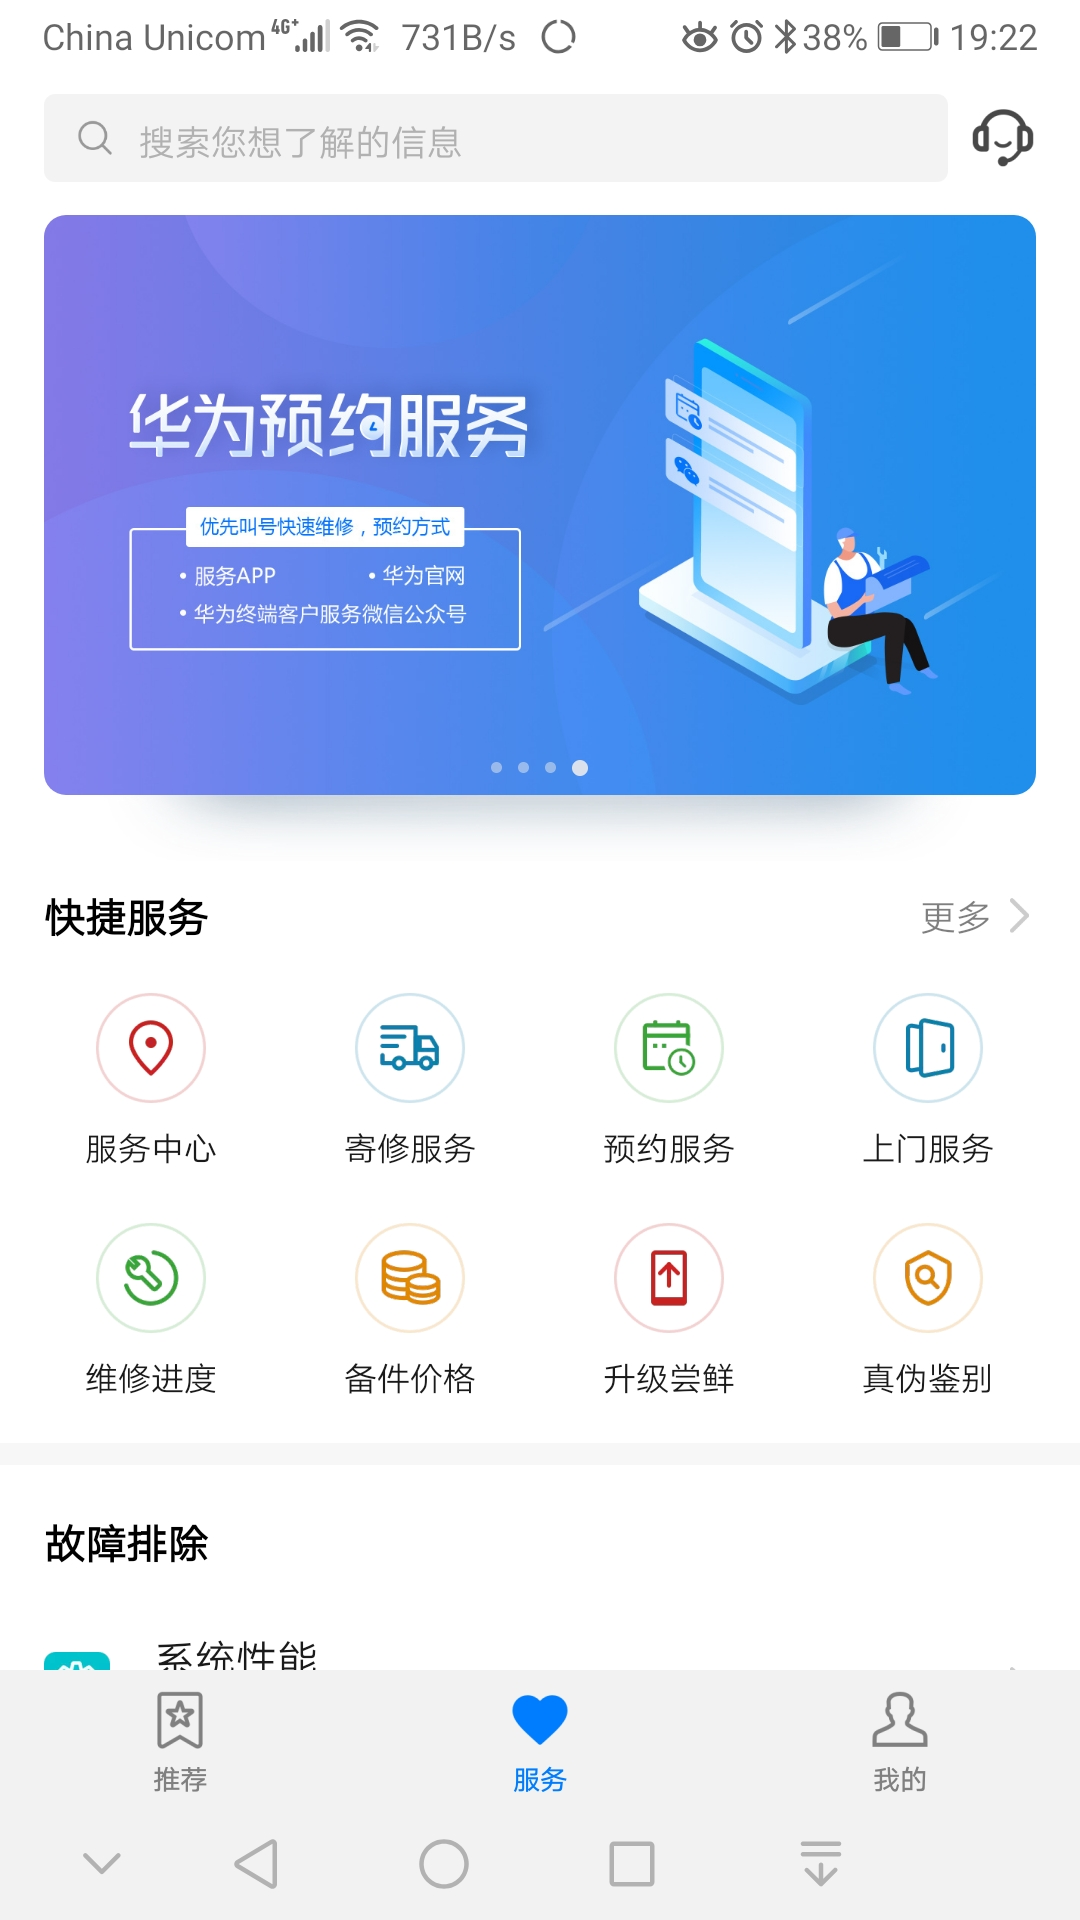 Screenshot_20190324_192207_com.huawei.phoneservice.jpg